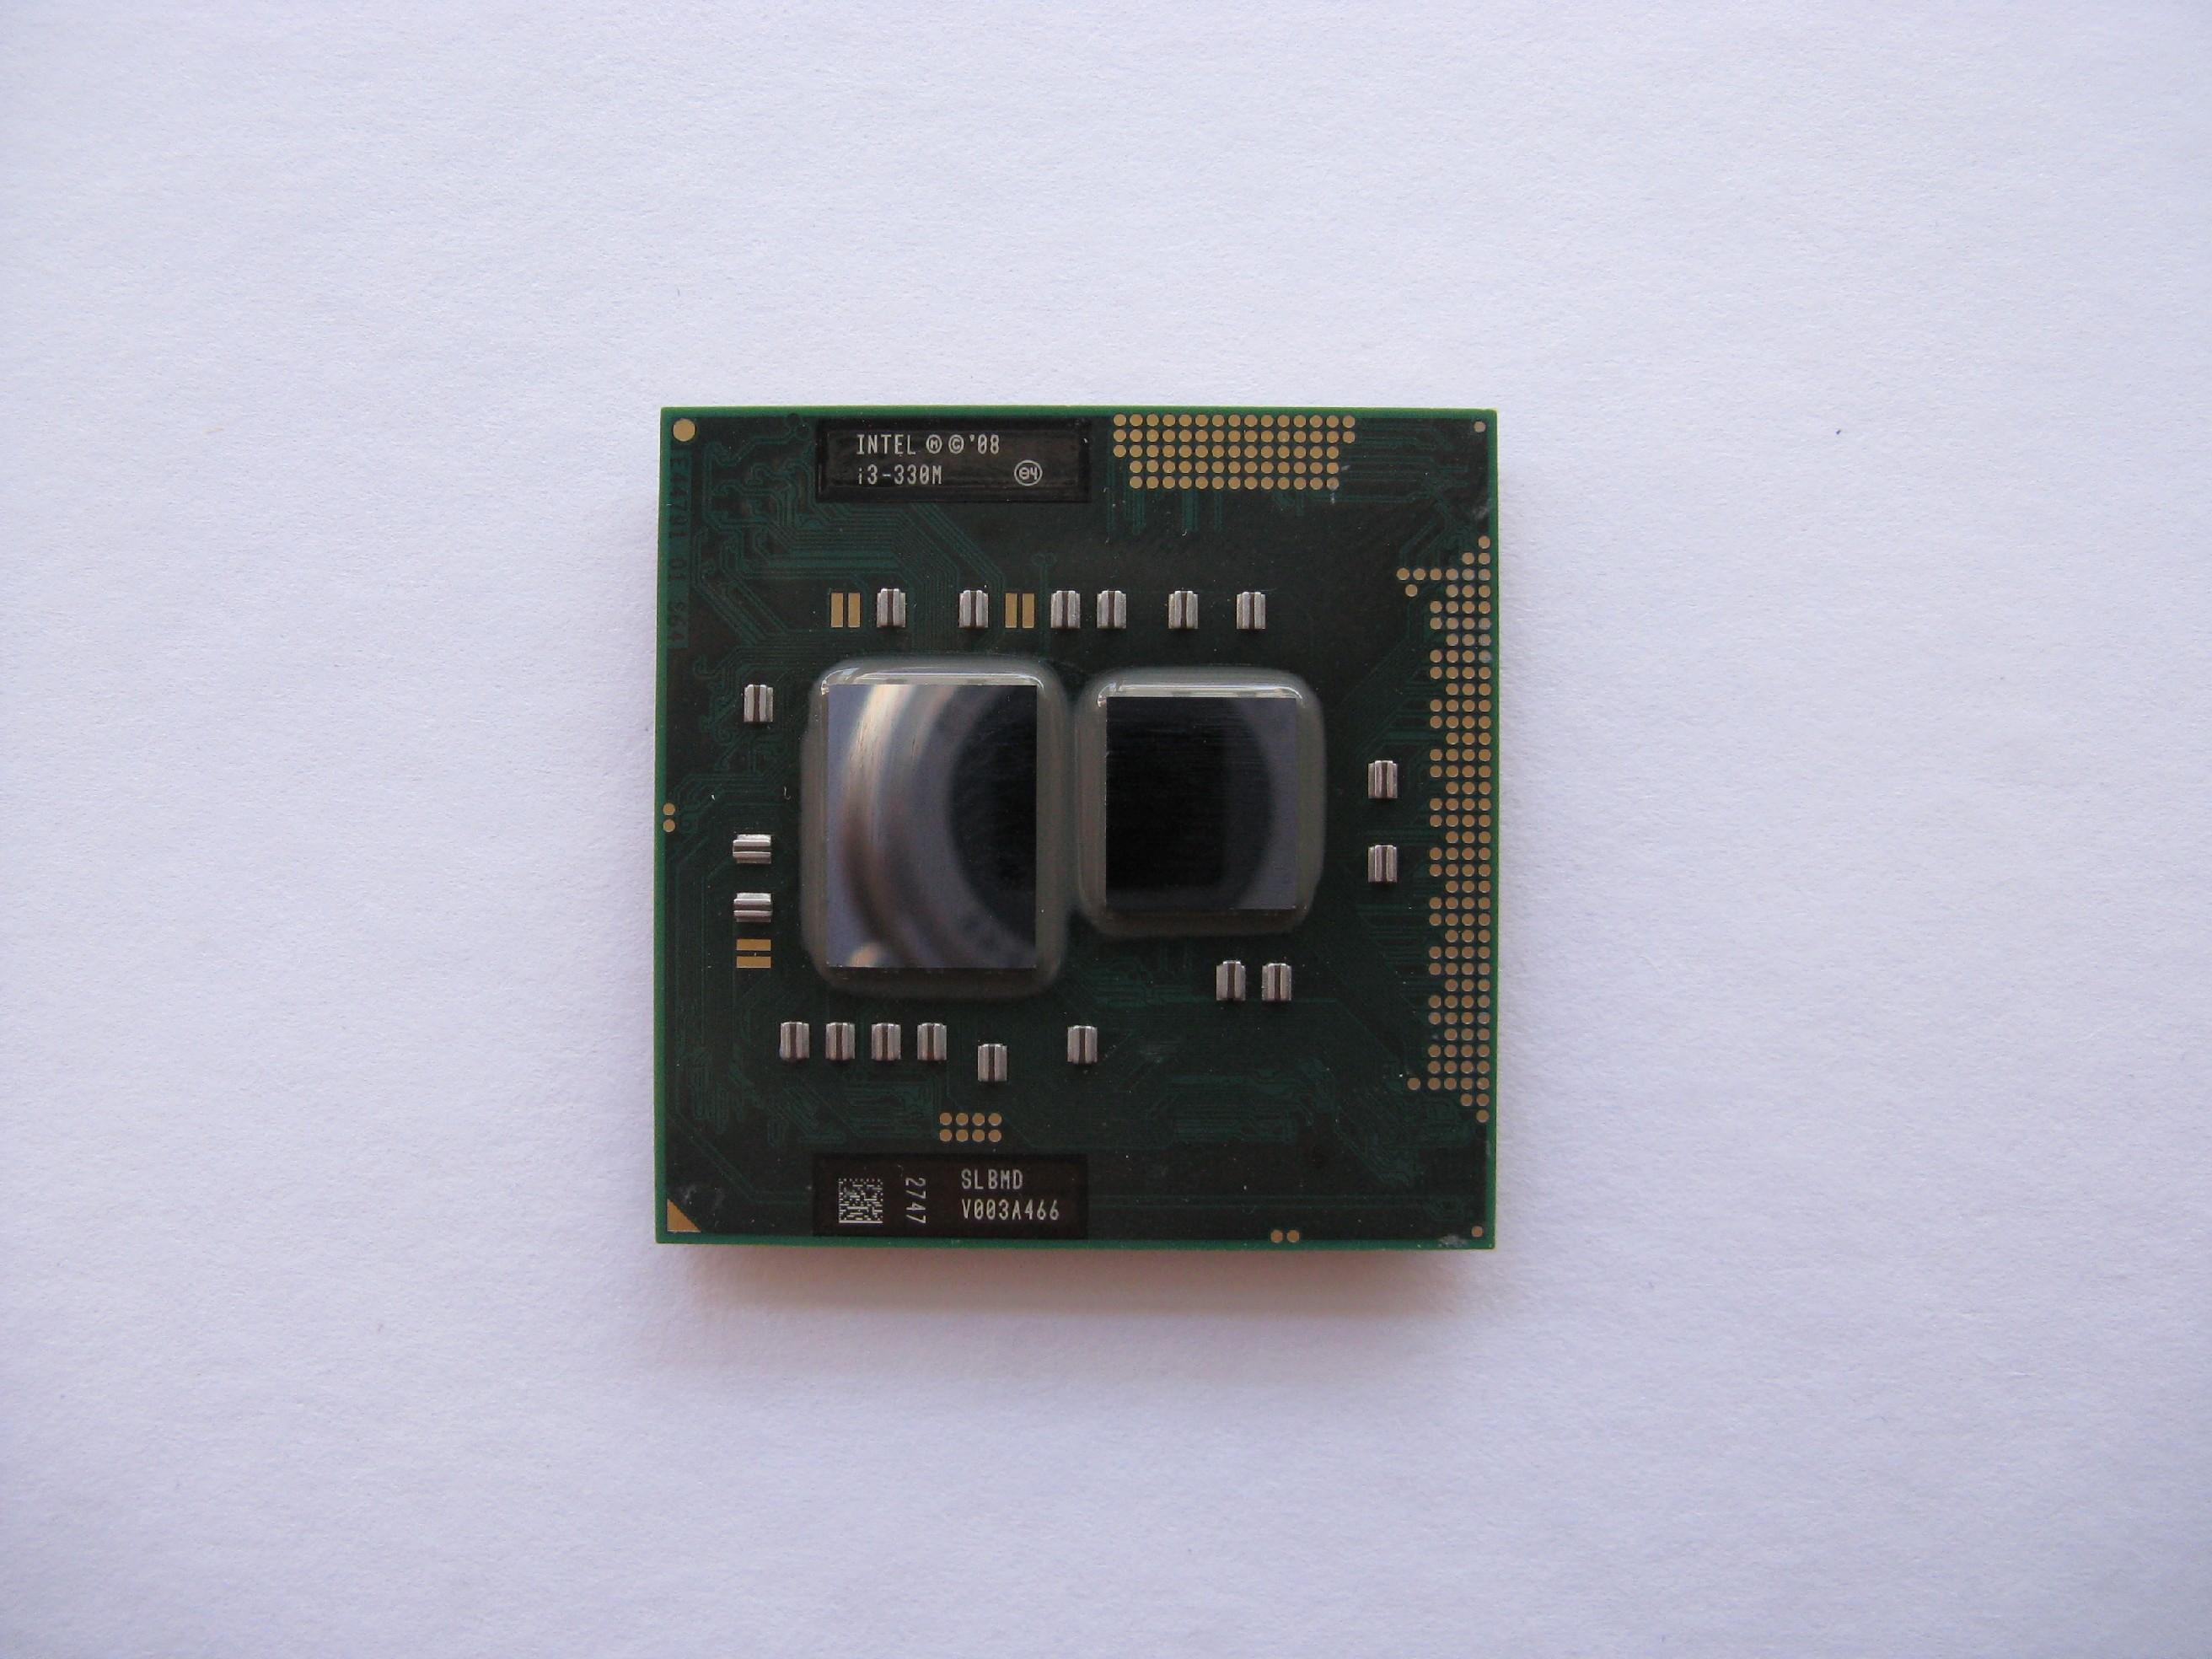 Intel Core i3-330M, 2.13GHz